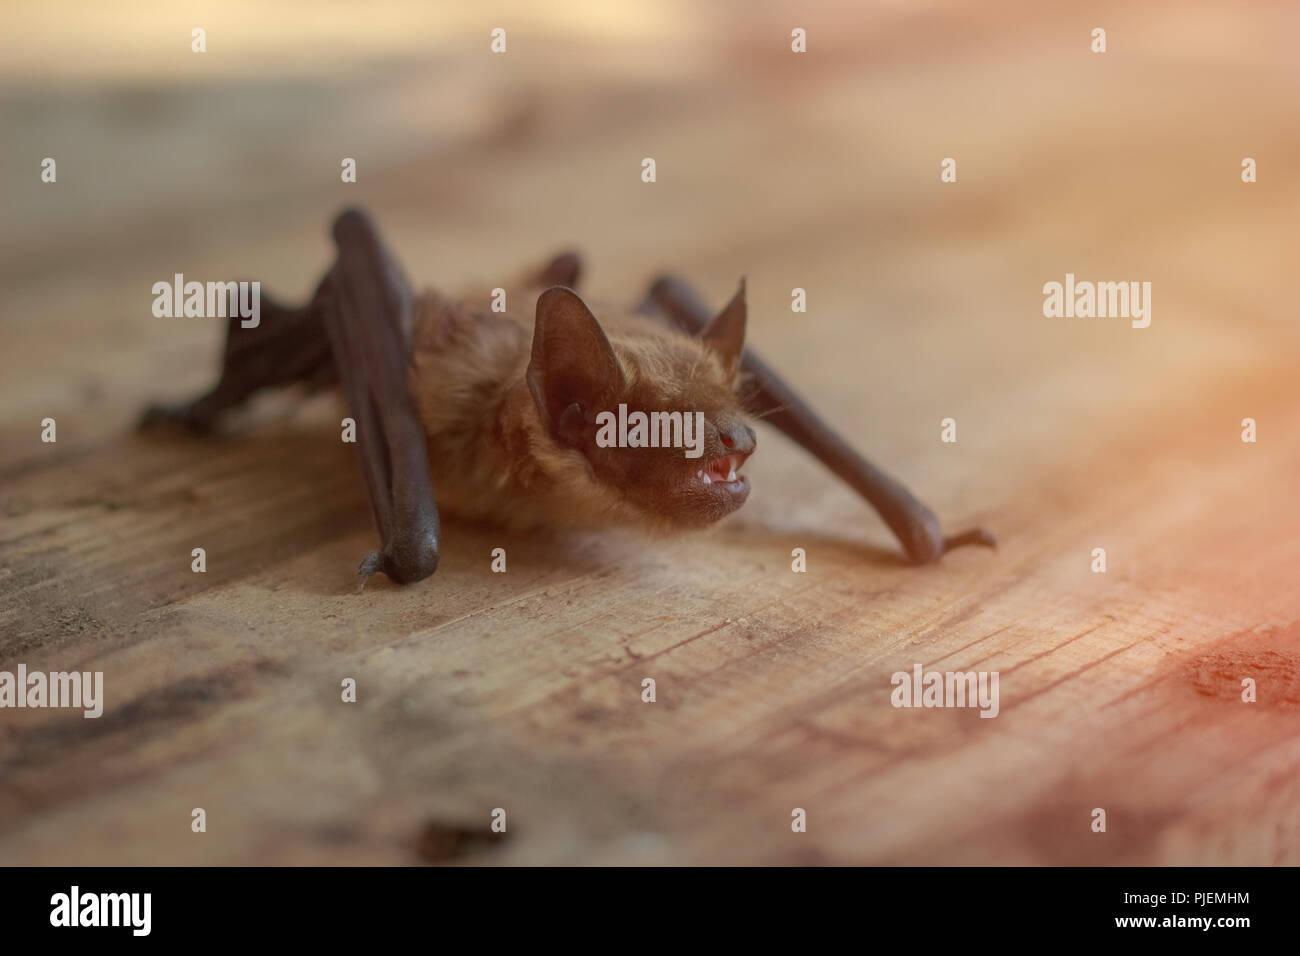 Beautiful Little Bat On A Wooden Surface Stock Photo 217911728 Alamy